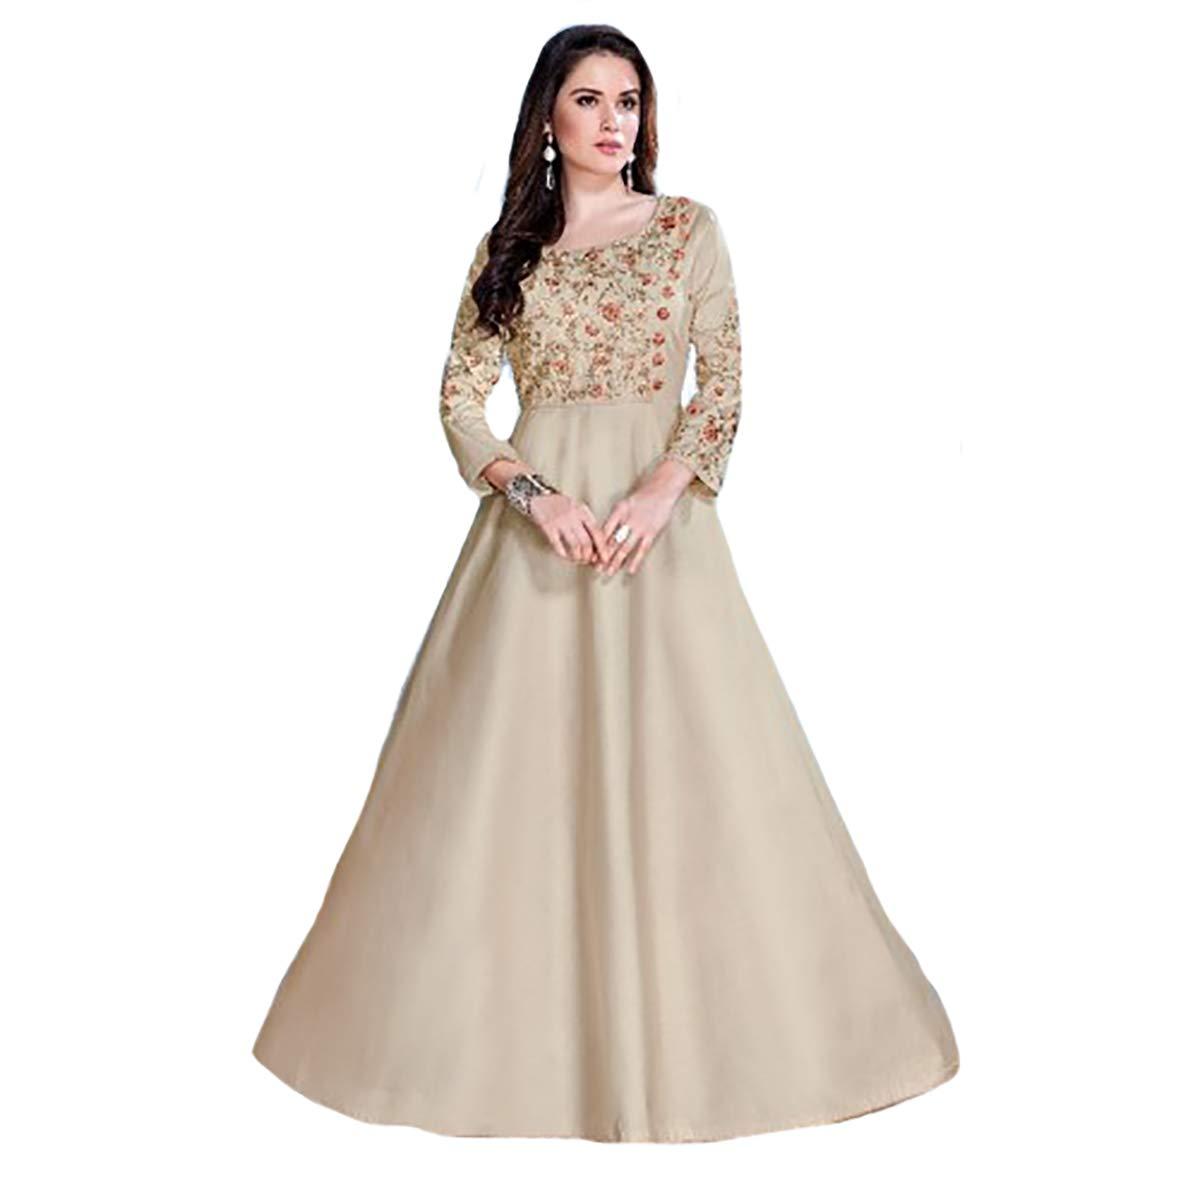 38bb8e62f82 Used Pakistani Wedding Dresses For Sale - Data Dynamic AG